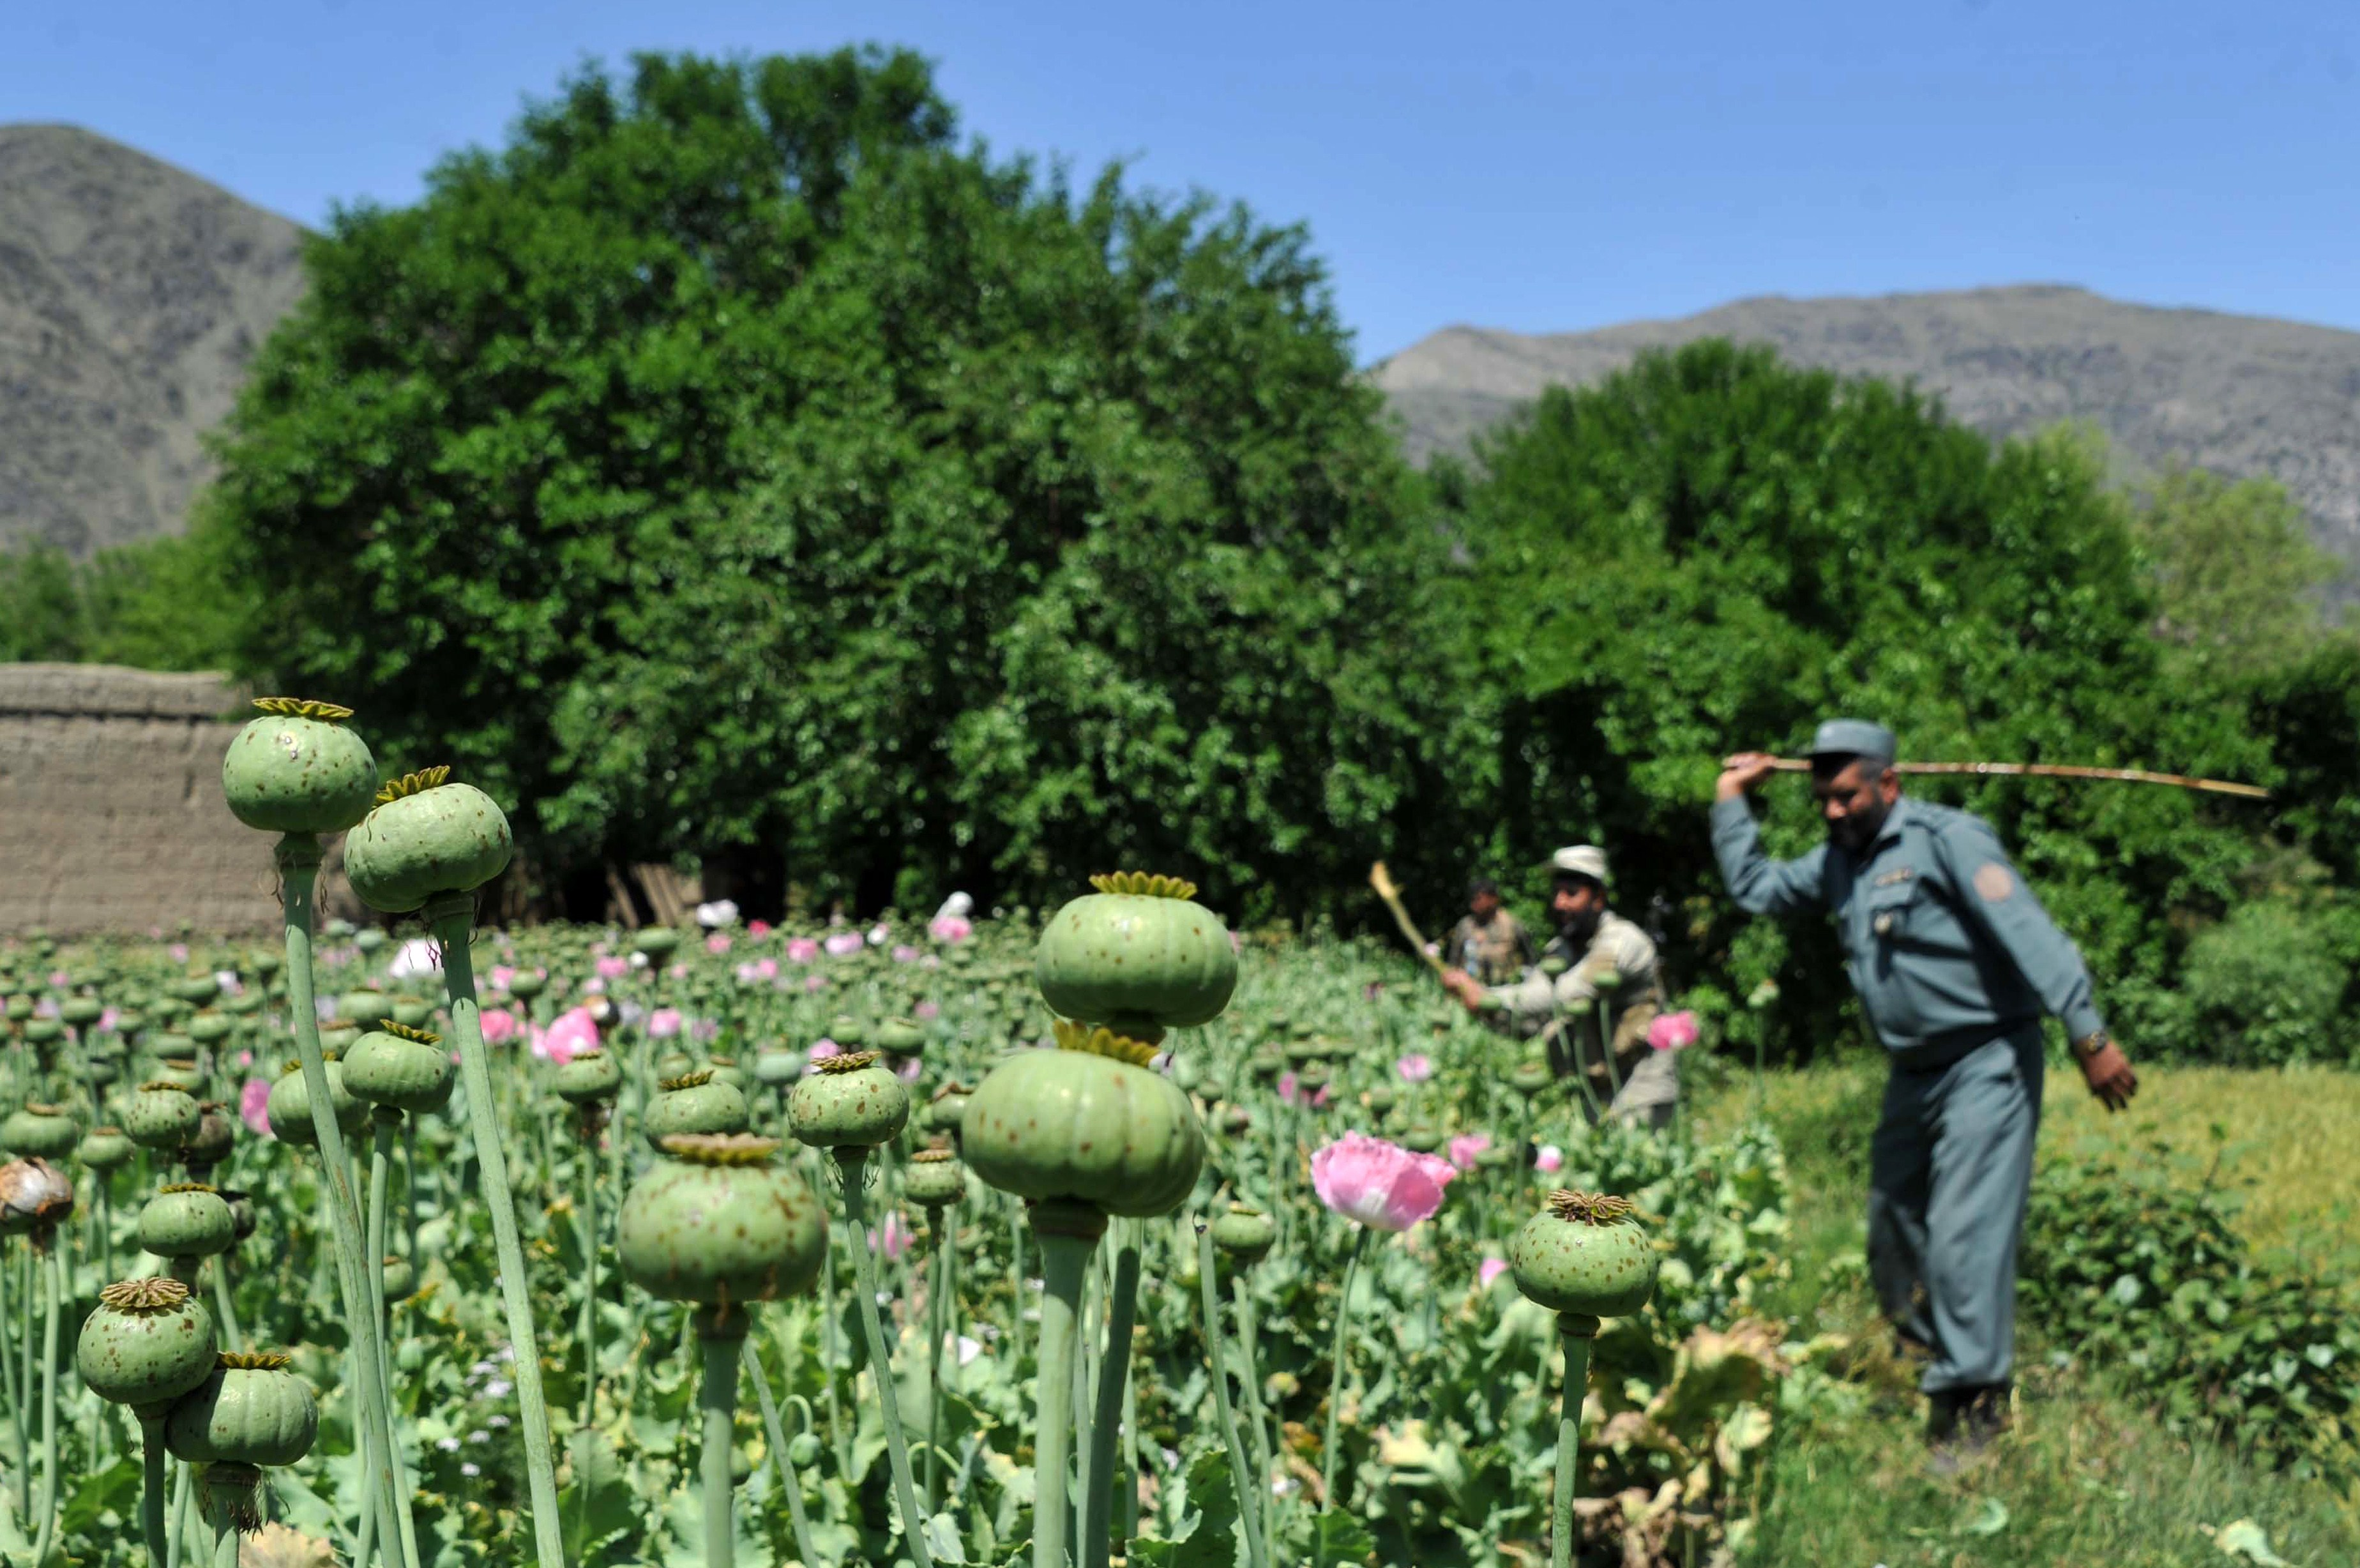 Afghanistan opium poppy cultivation up 7 percent, U.N ... Opium Drug Plant